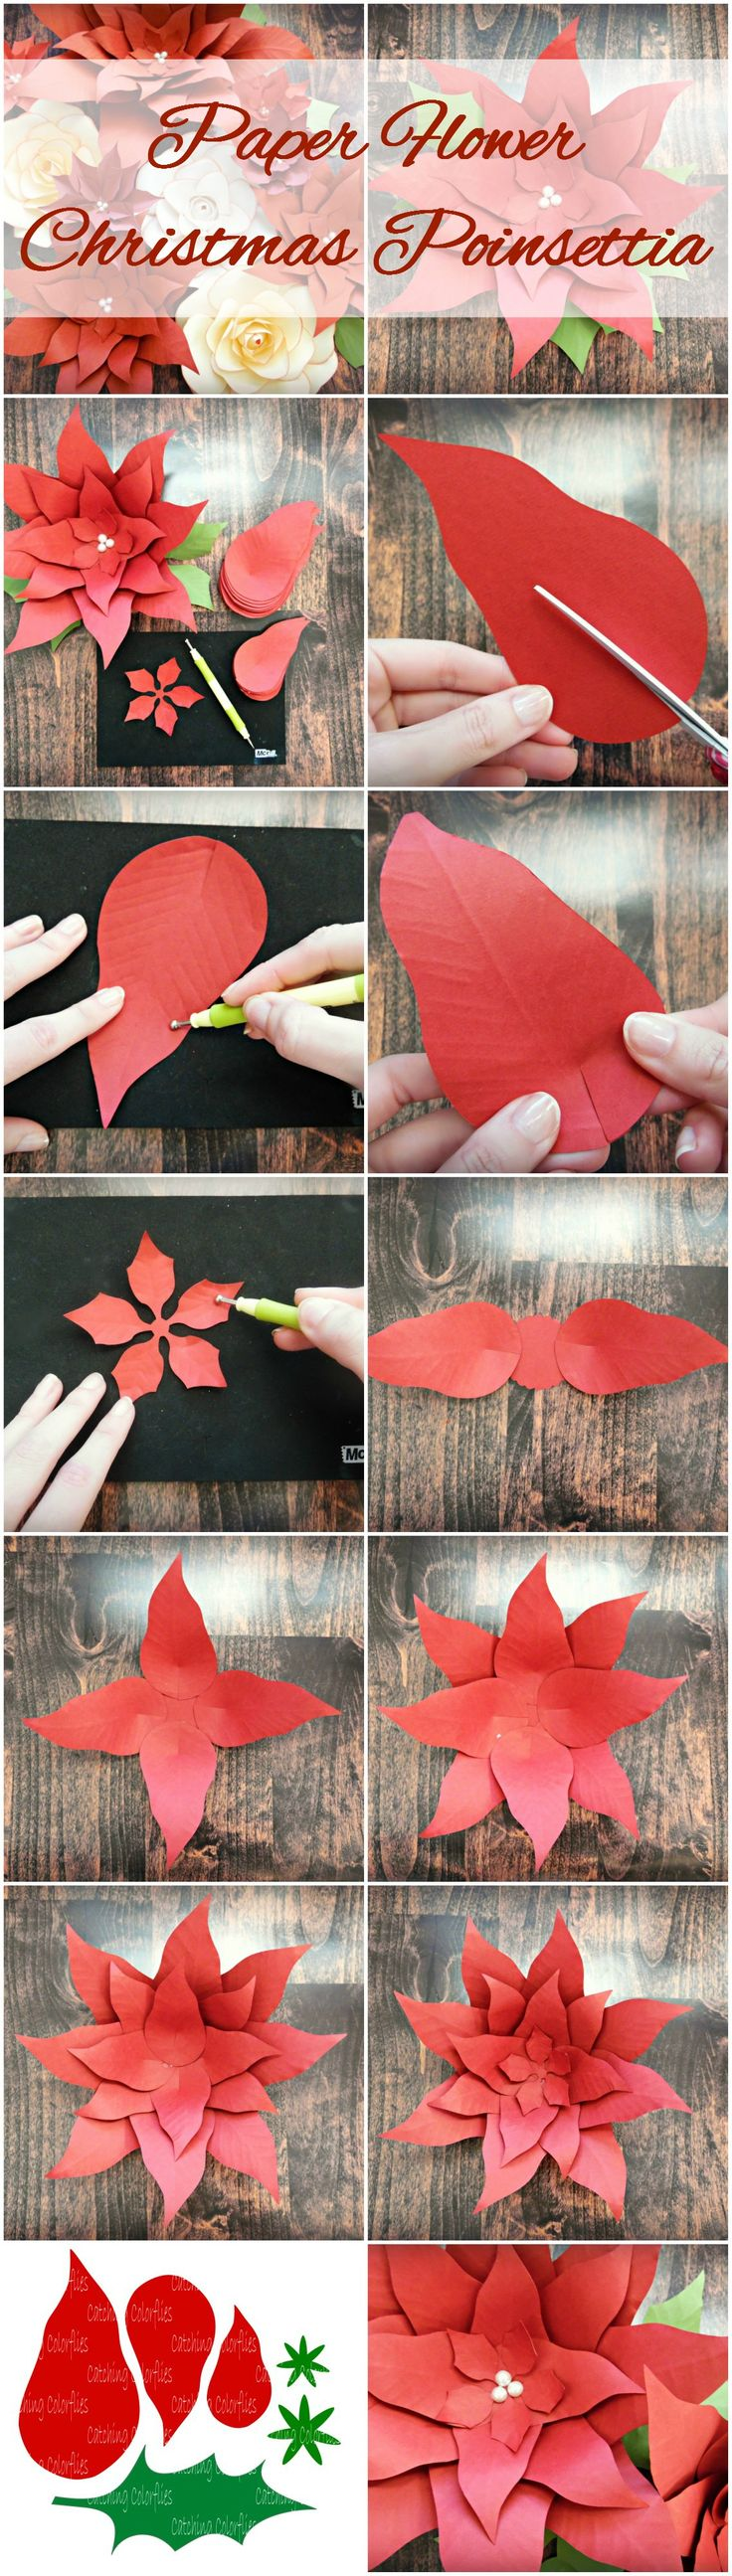 Christmas Giant Poinsettia Paper Flowers- DIY Christmas Backdrop, Flower Templates & Tutorial, SVG cut files